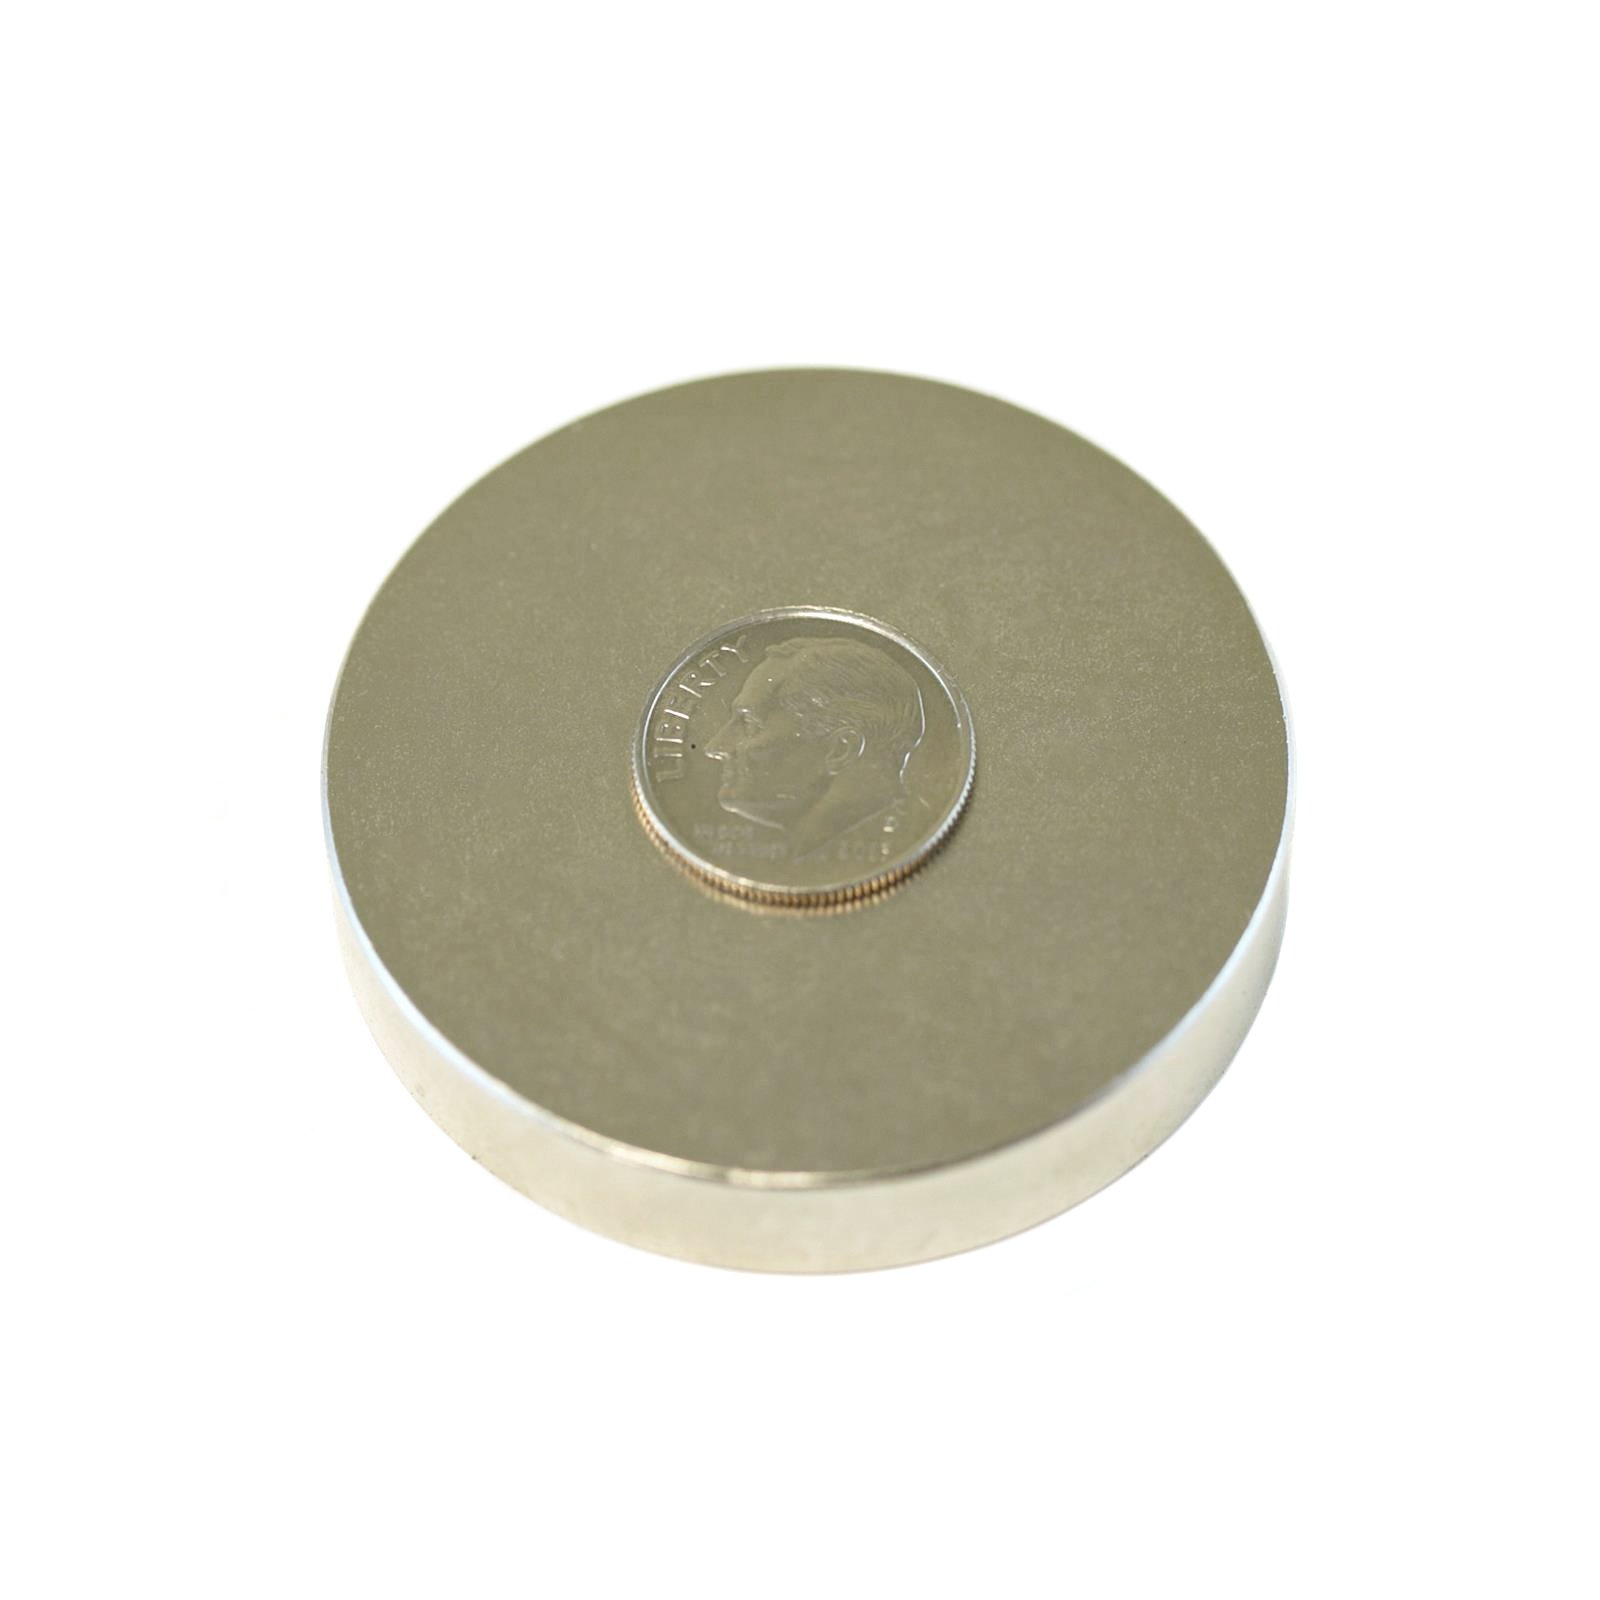 Applied Magnets 1 Piece 2'' x 3/8'' Grade N42 Neodymium Disc Magnet